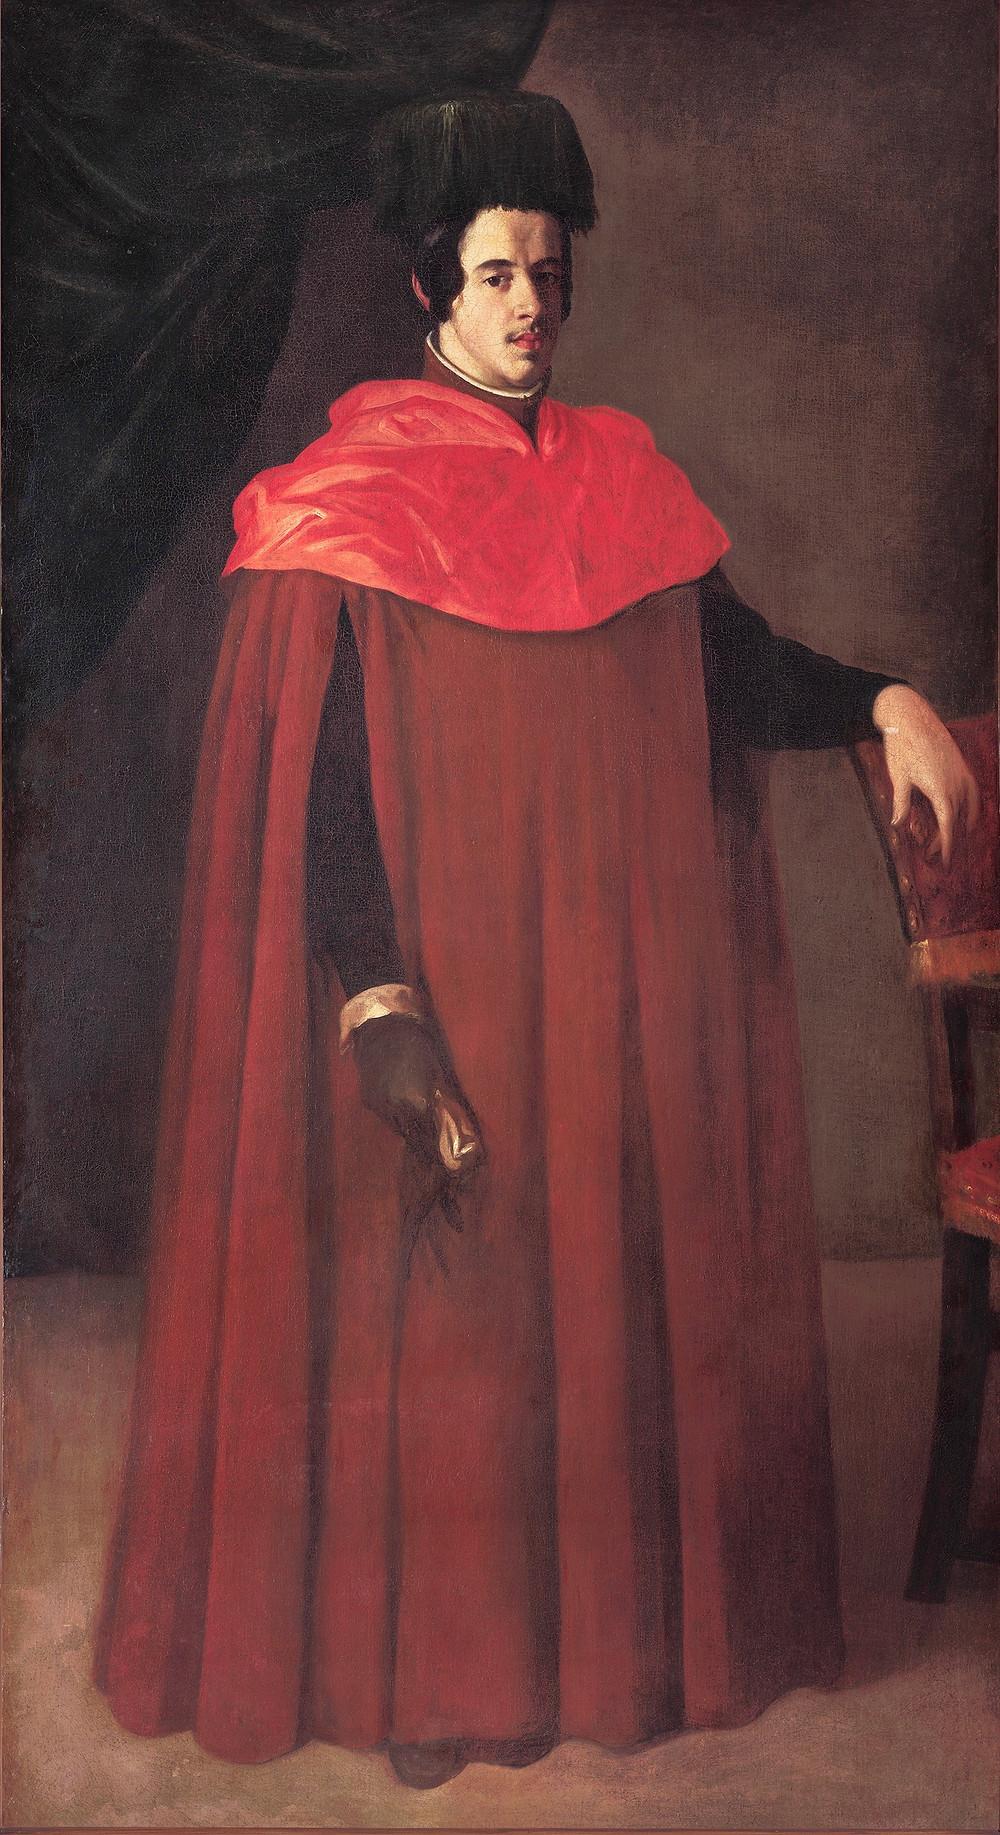 Francisco Zubaran, A Doctor of Law, 1635